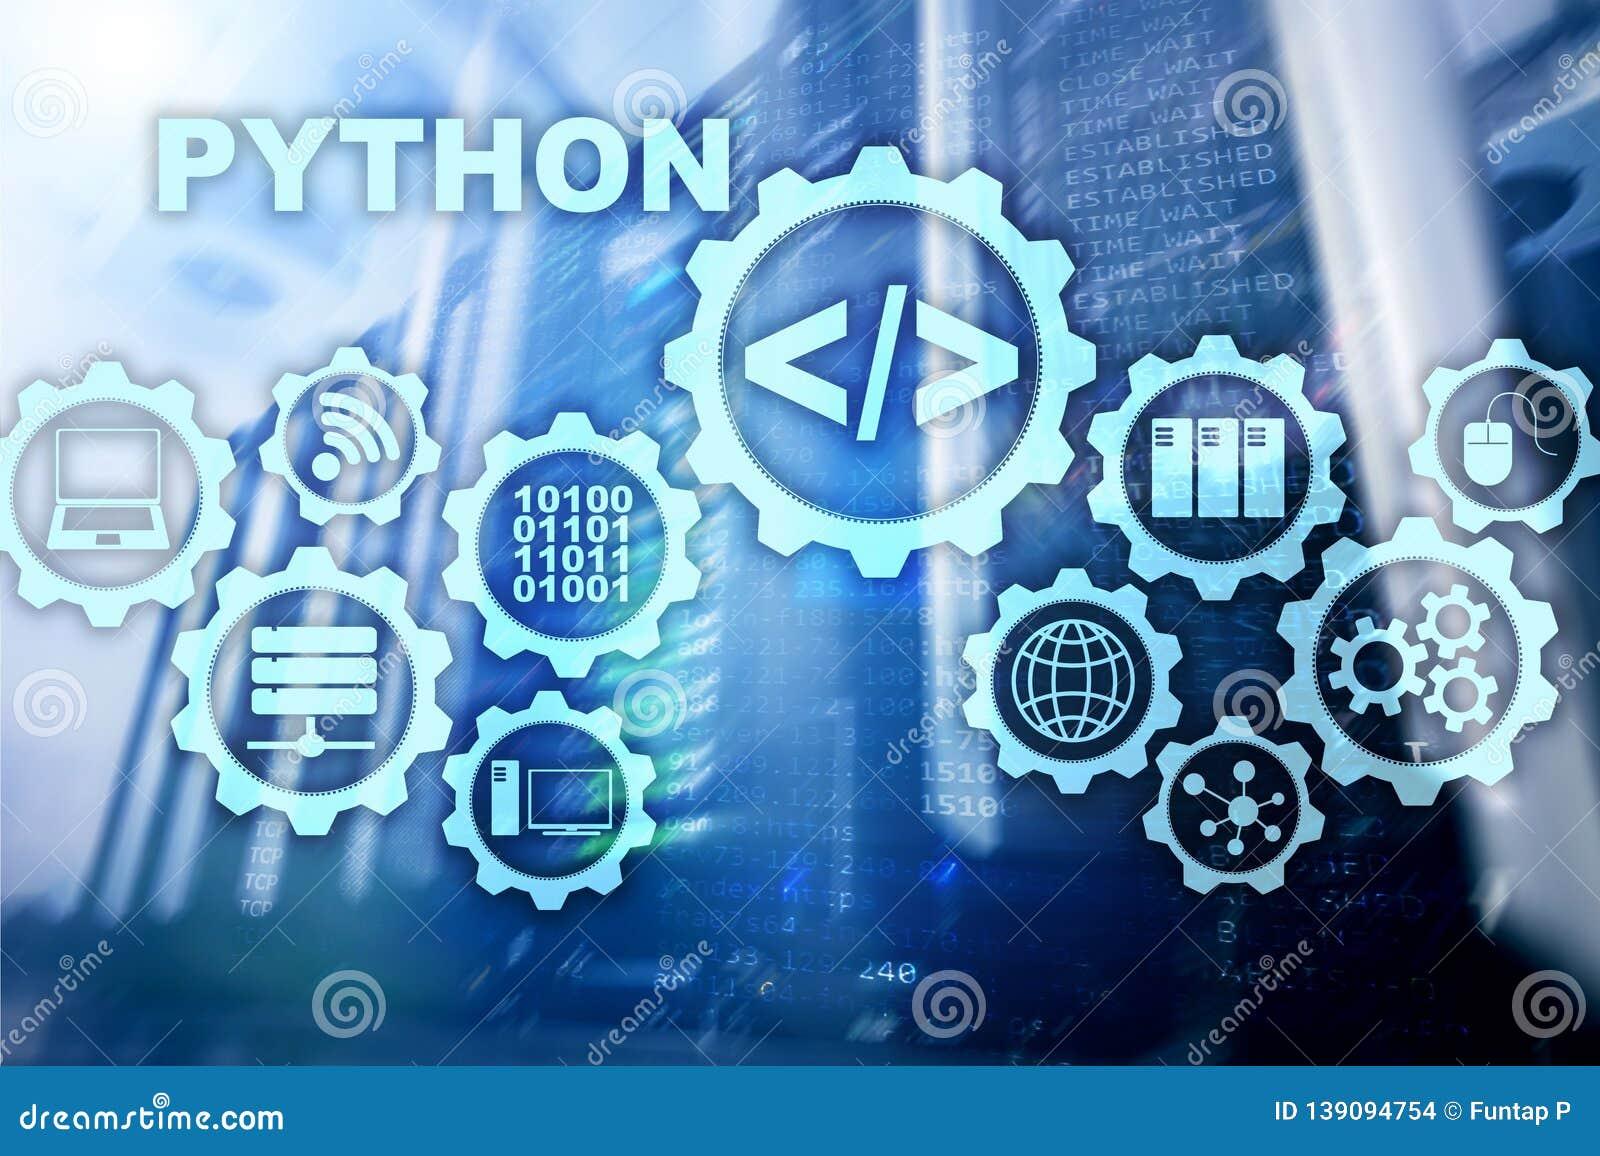 Python Programming Language On Server Room Background